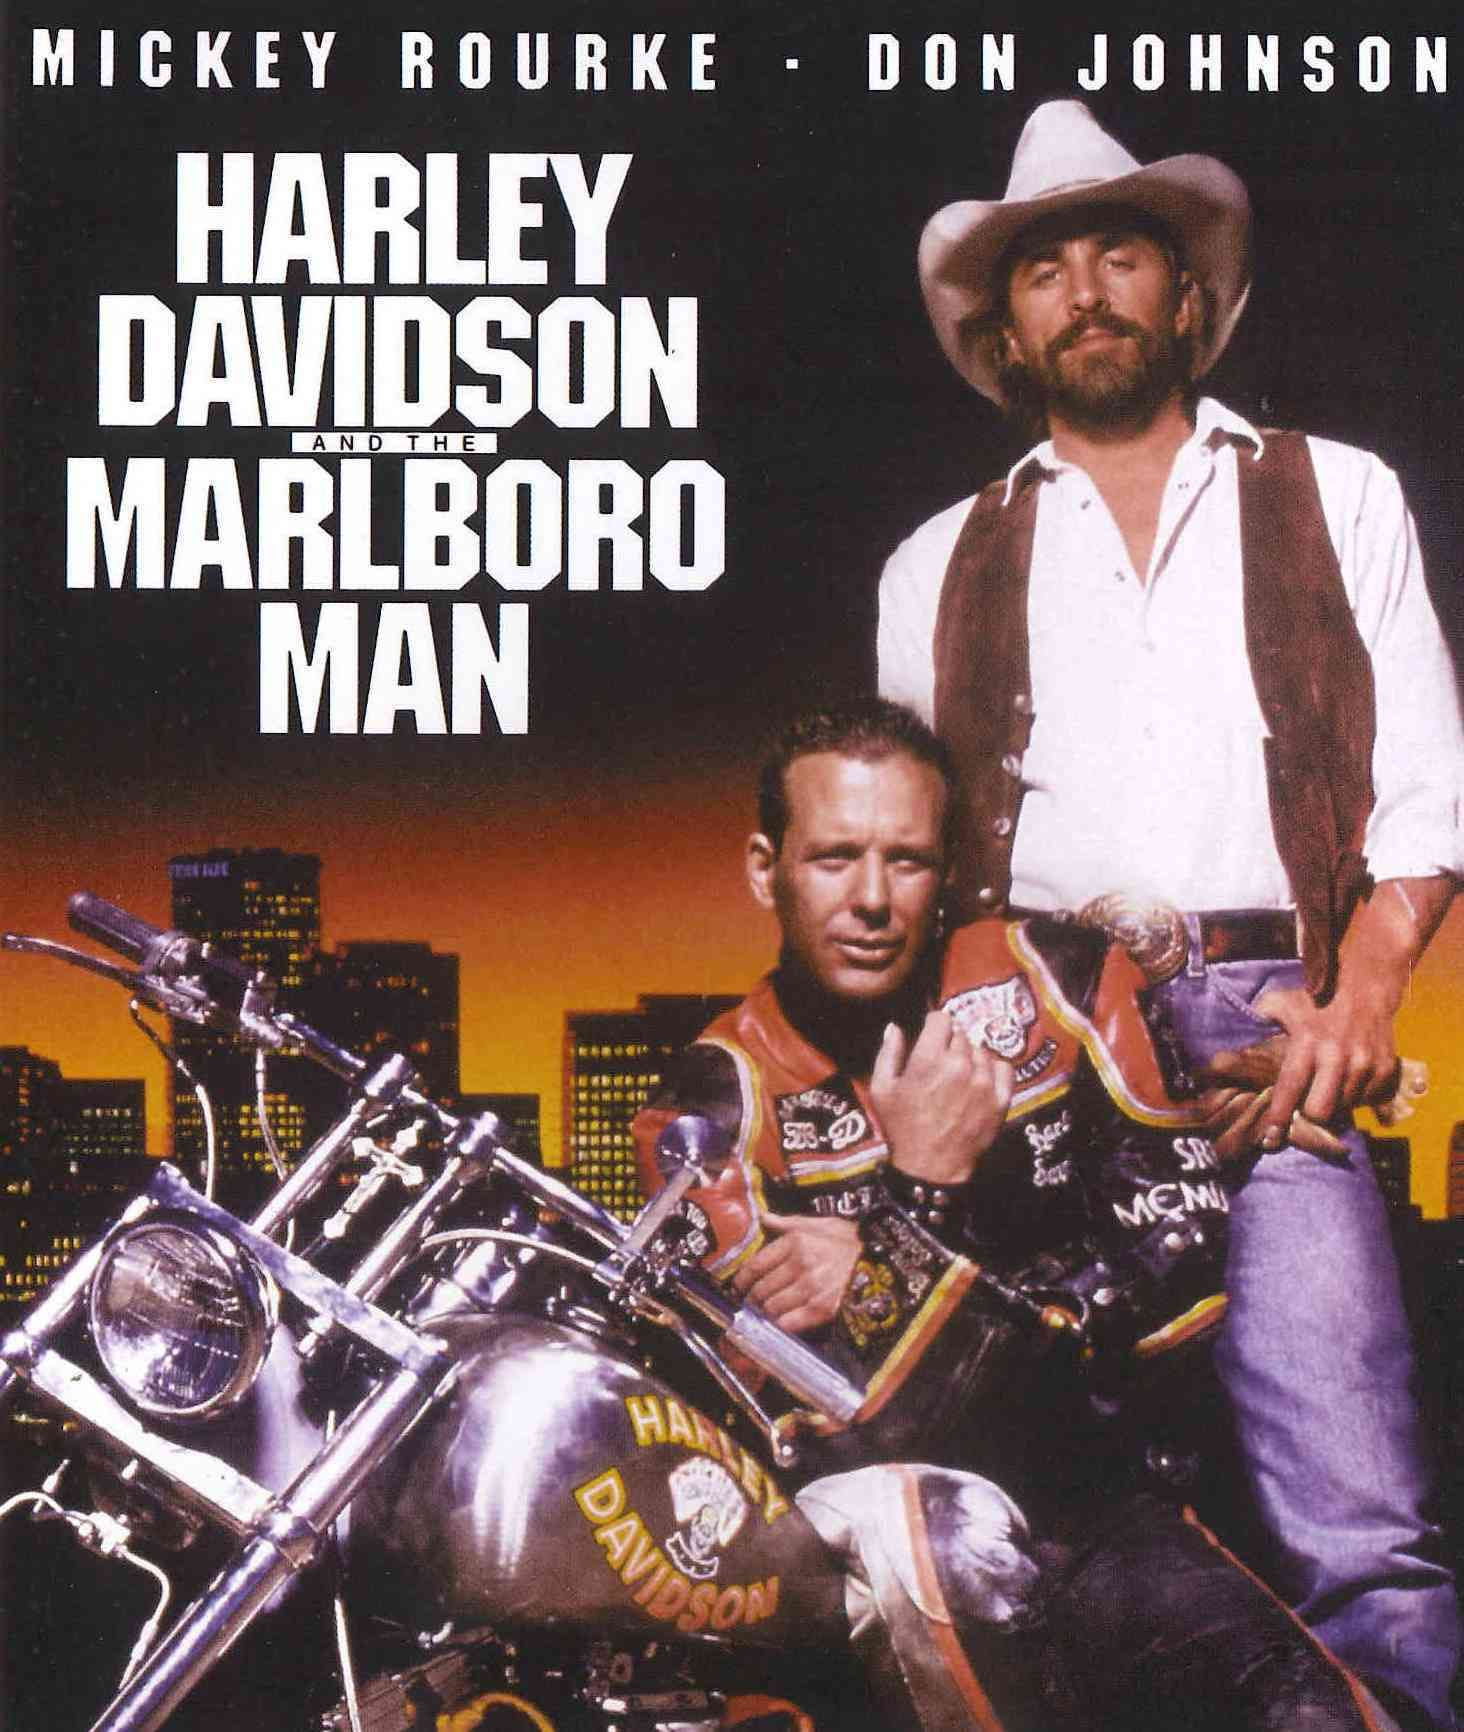 Harley Davidson And The Marlboro Man Marlboro Man Harley Davidson Mickey Rourke